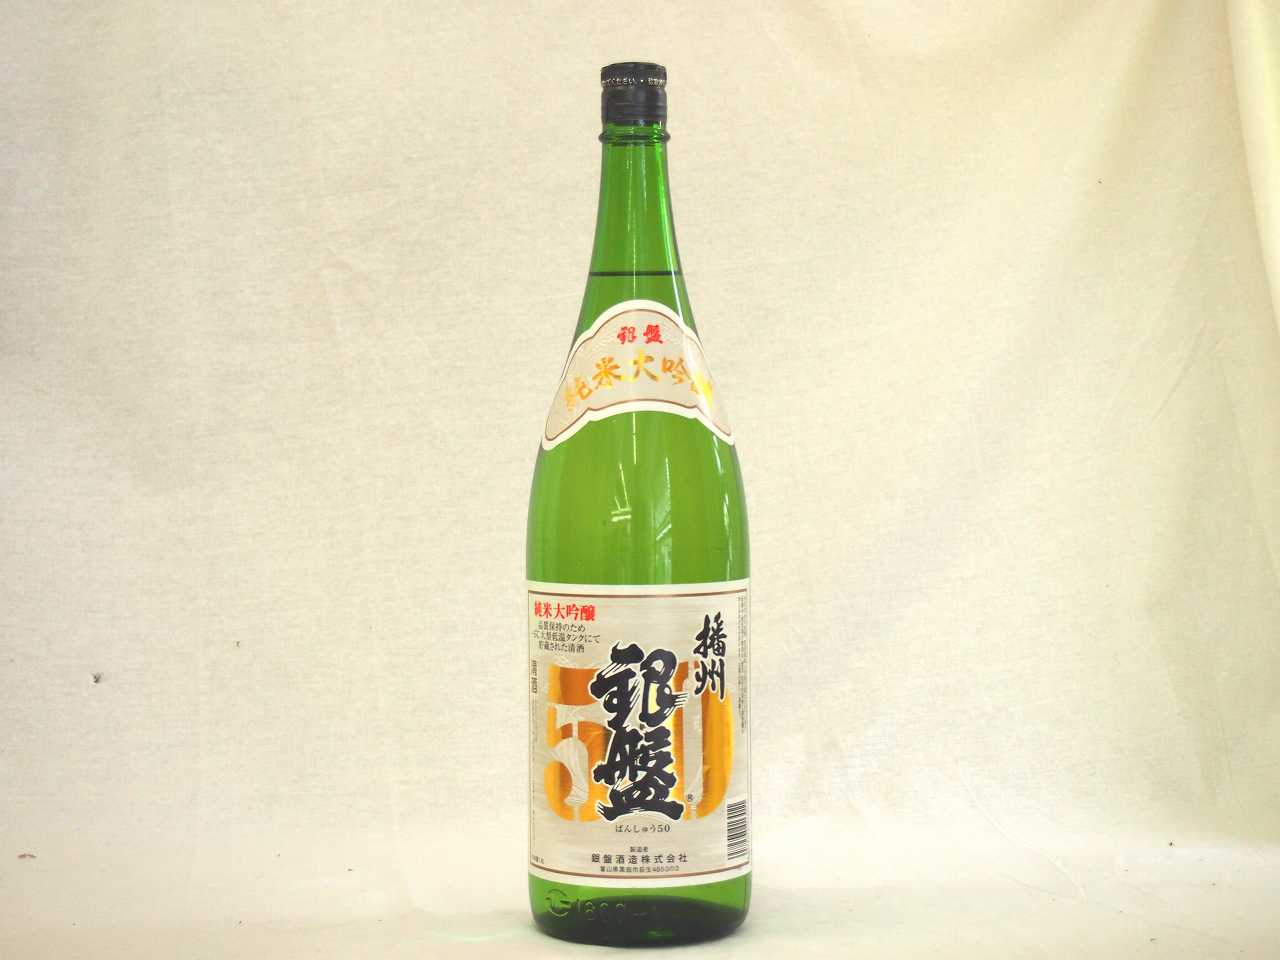 【 6本セット】銀盤酒造 銀盤 播州50 大吟醸 1800ml×6本